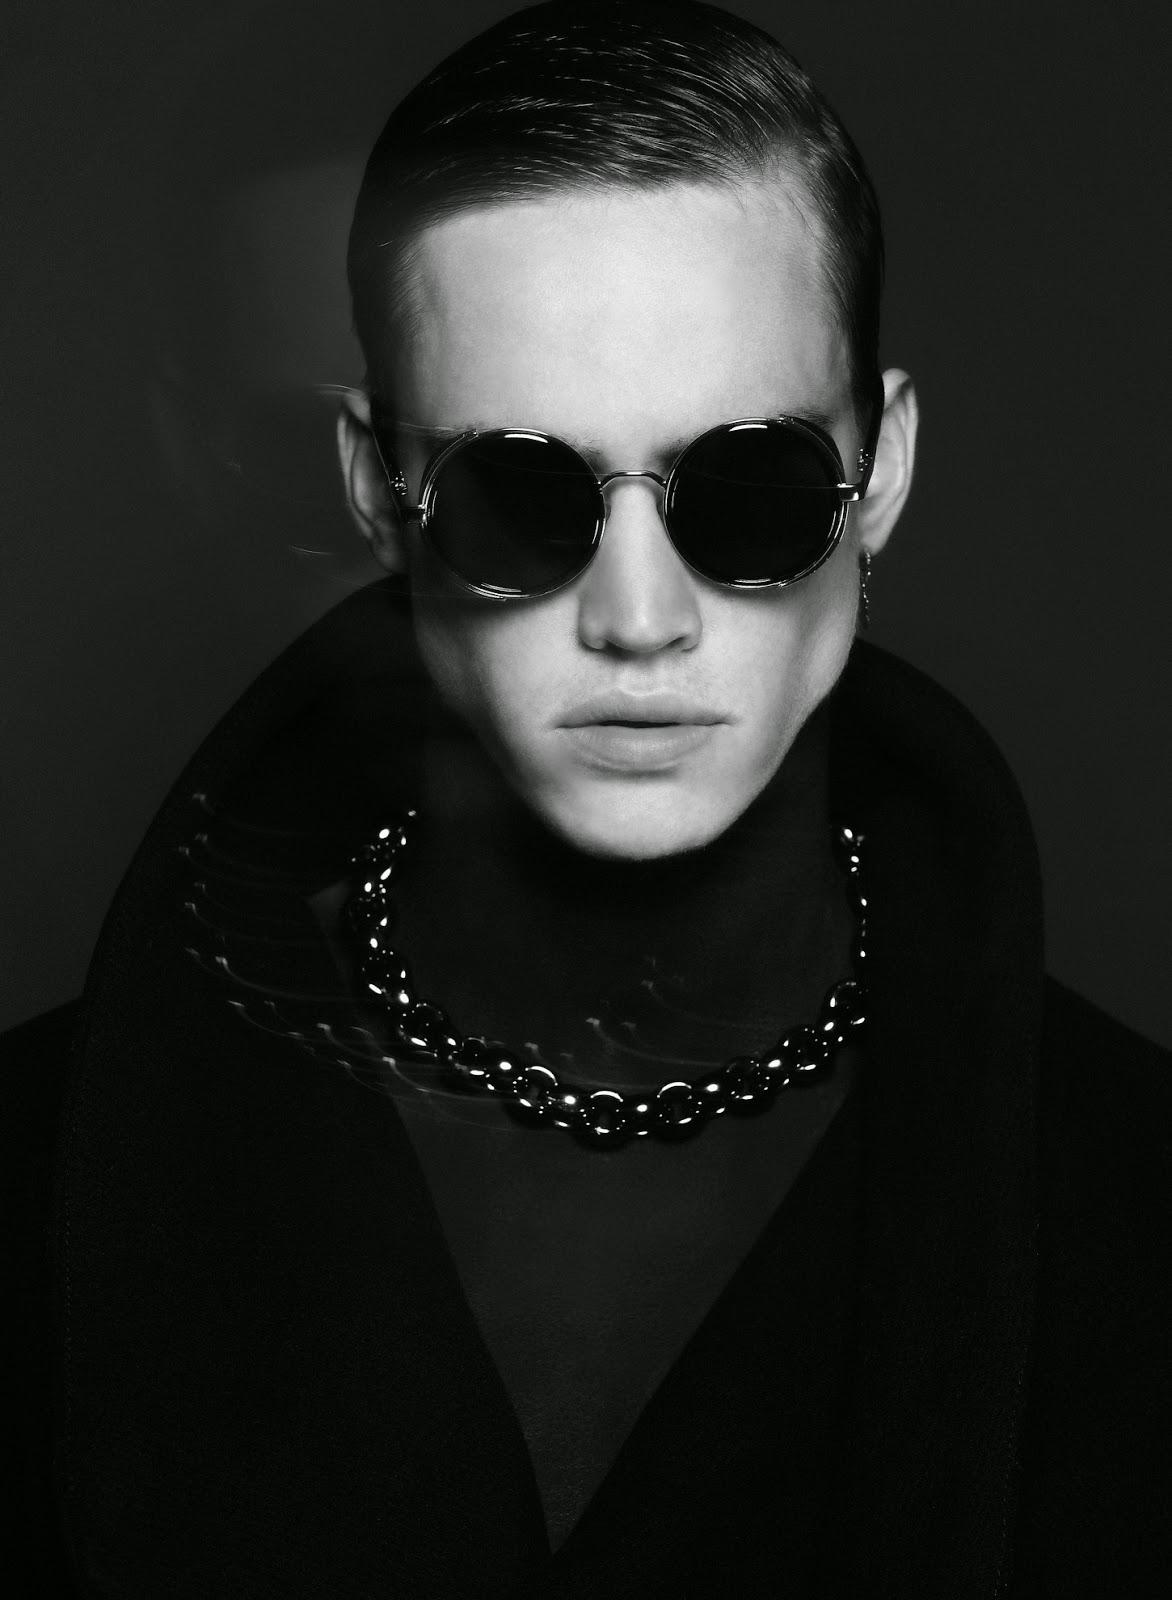 Der Stefashionist Fashion Passion Models Marc Schulze: Der Stefashionist: Fashion, Passion & Models: Mate Kovacs